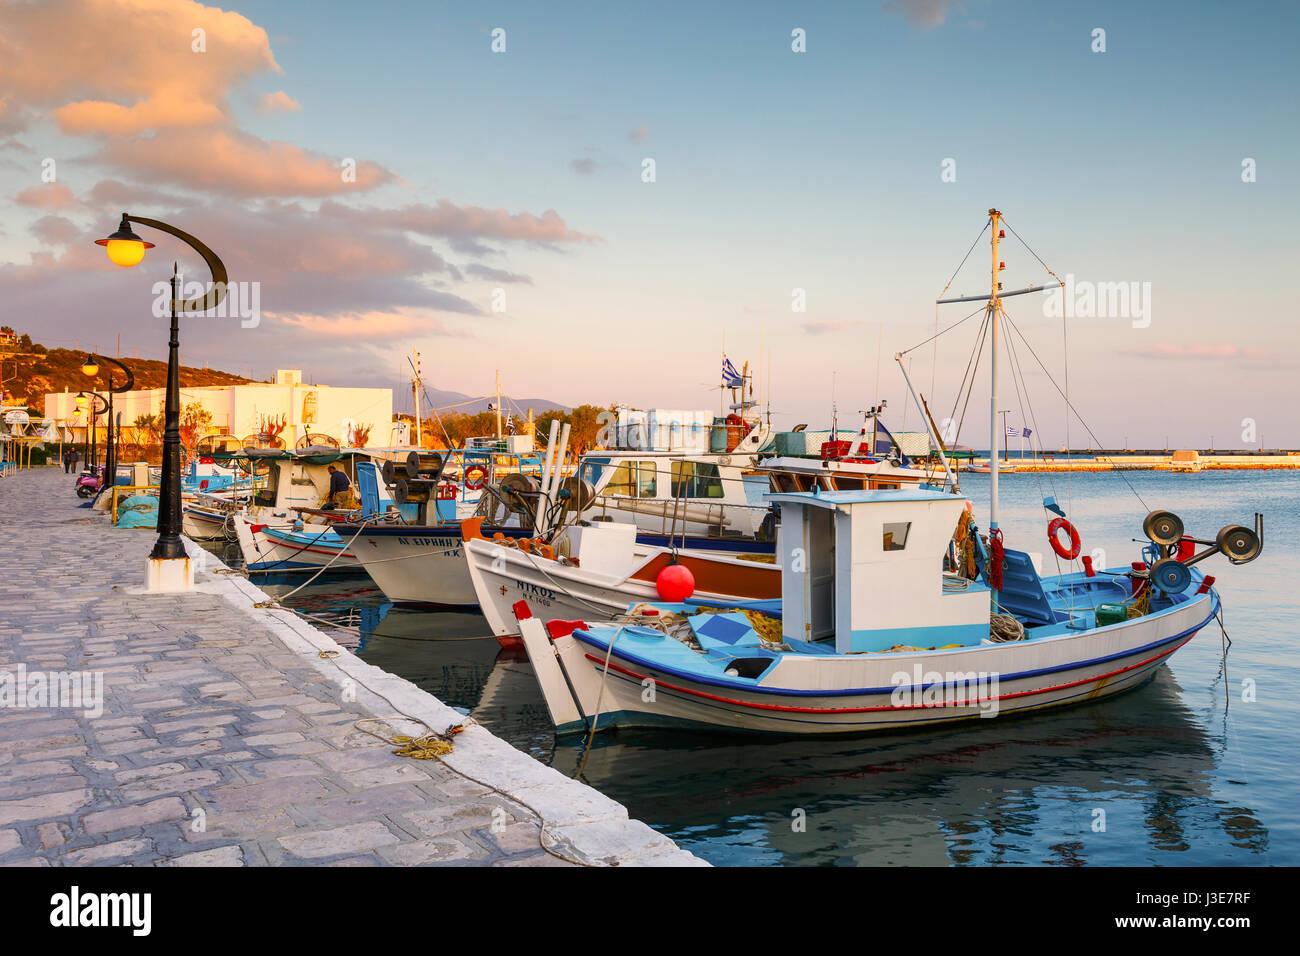 Harbour of Pythagorio town on Samos island, Greece. Stock Photo